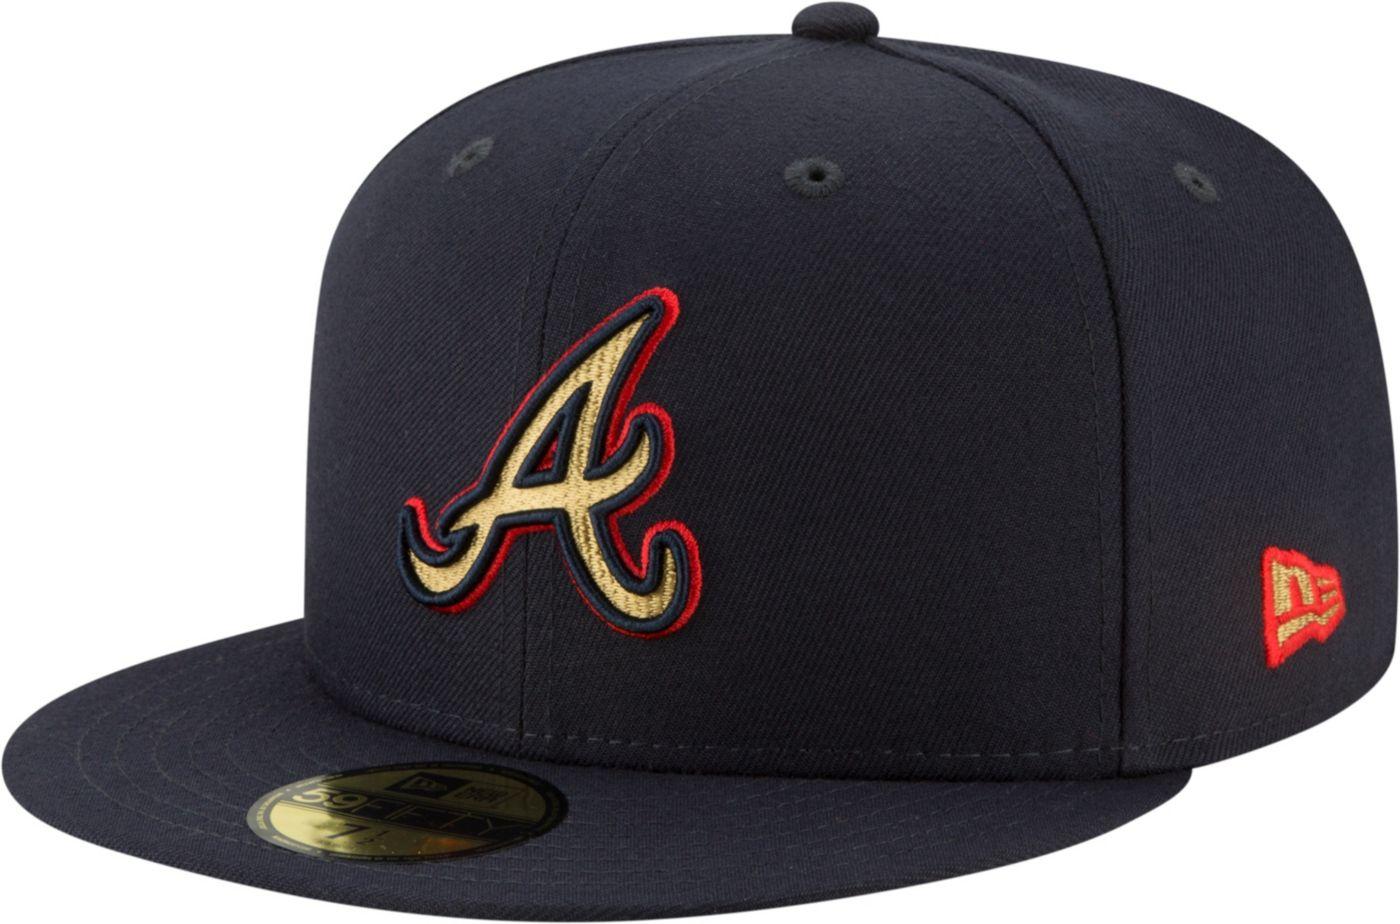 New Era Men's Atlanta Braves 59Fifty Logo Stopper Fitted Hat